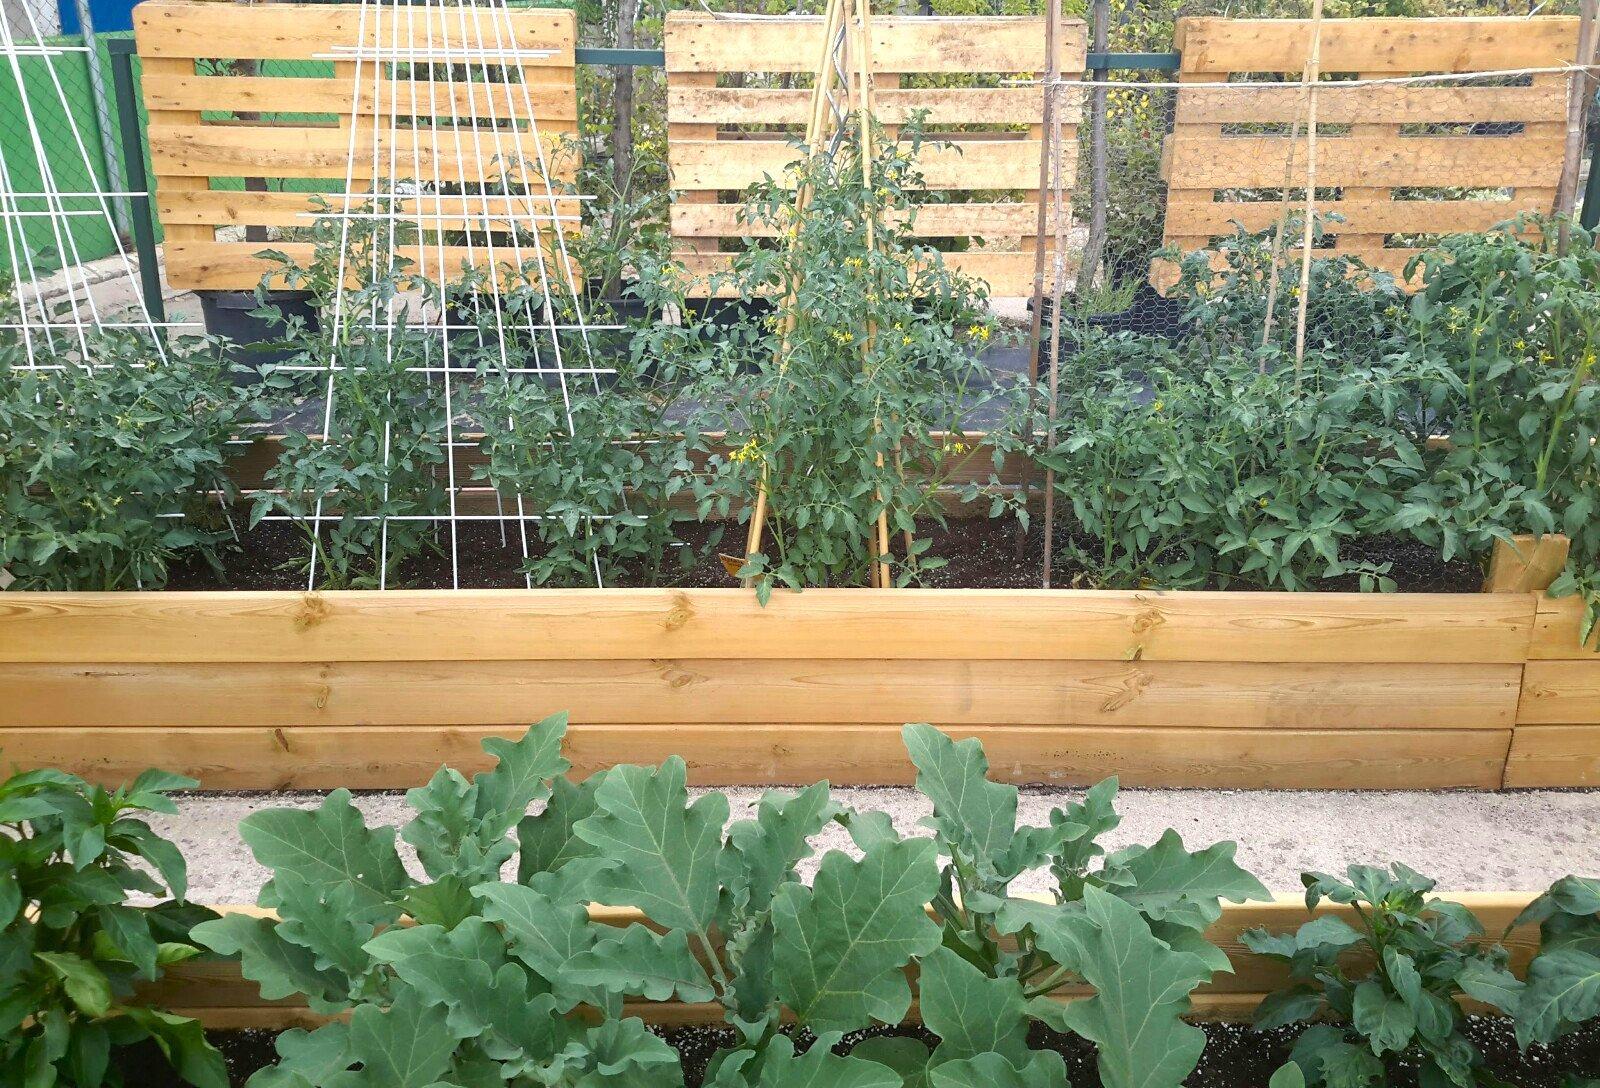 Centros de jardiner a arag n - Centro de jardineria madrid ...